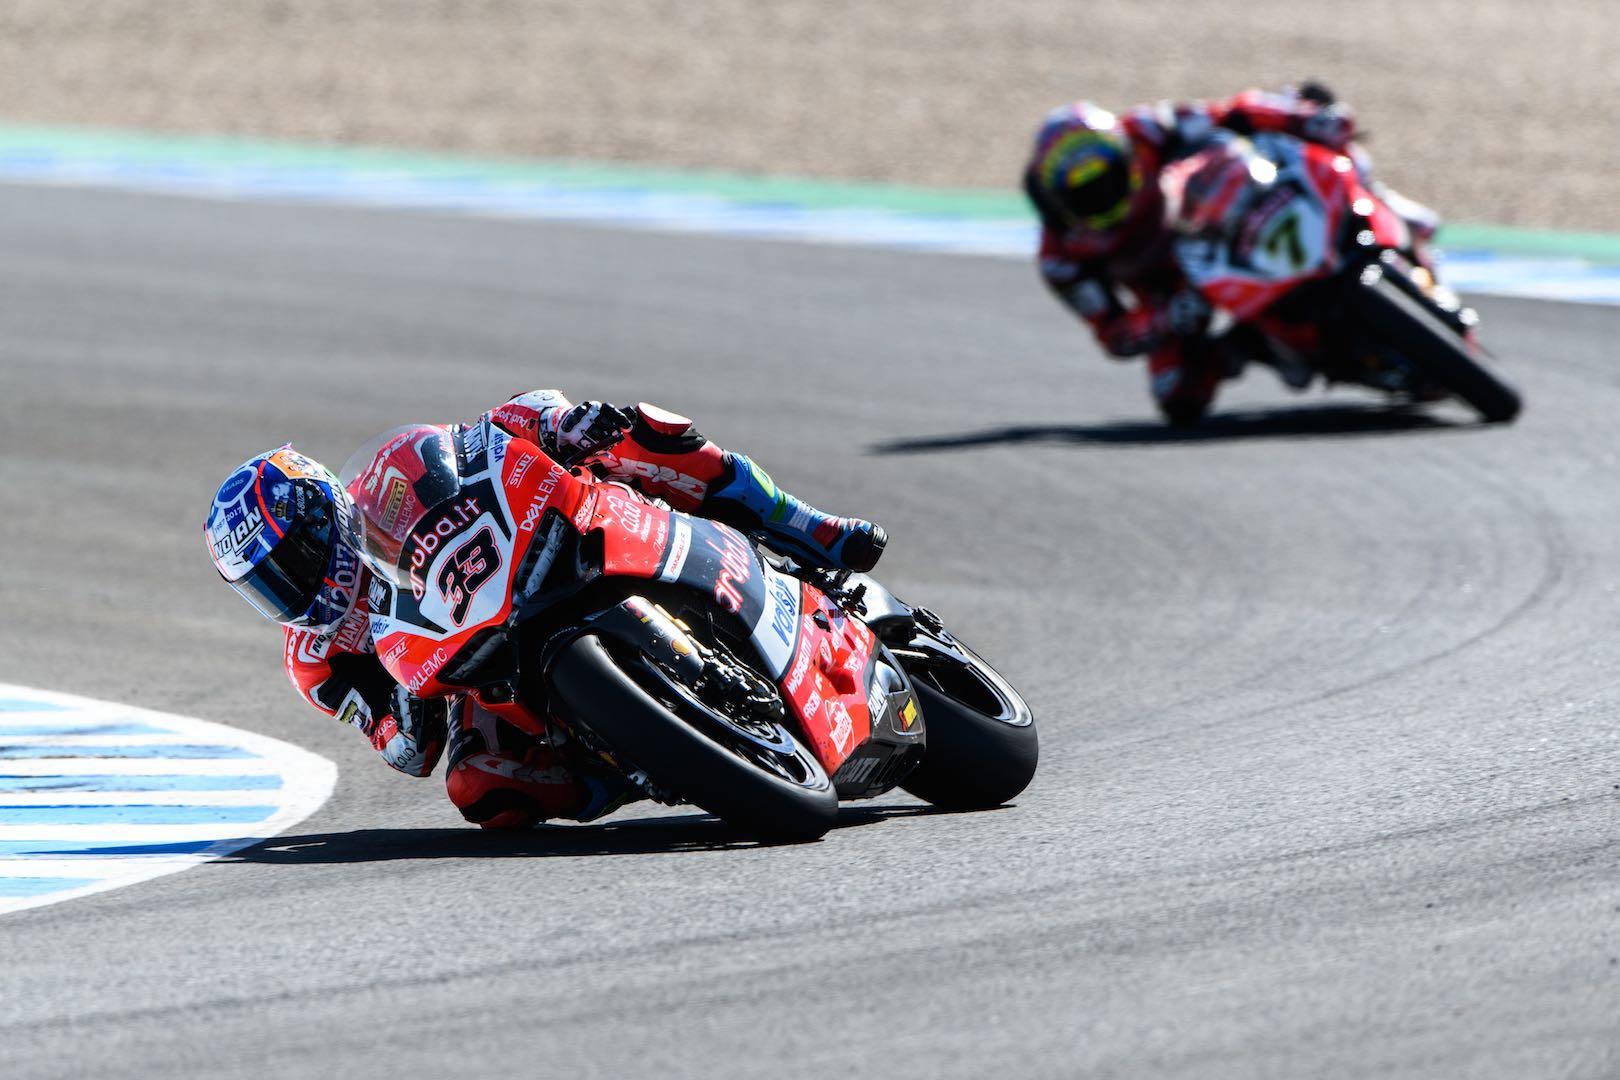 2017 Jerez World Superbike Results: Ducat's Marco Melandri